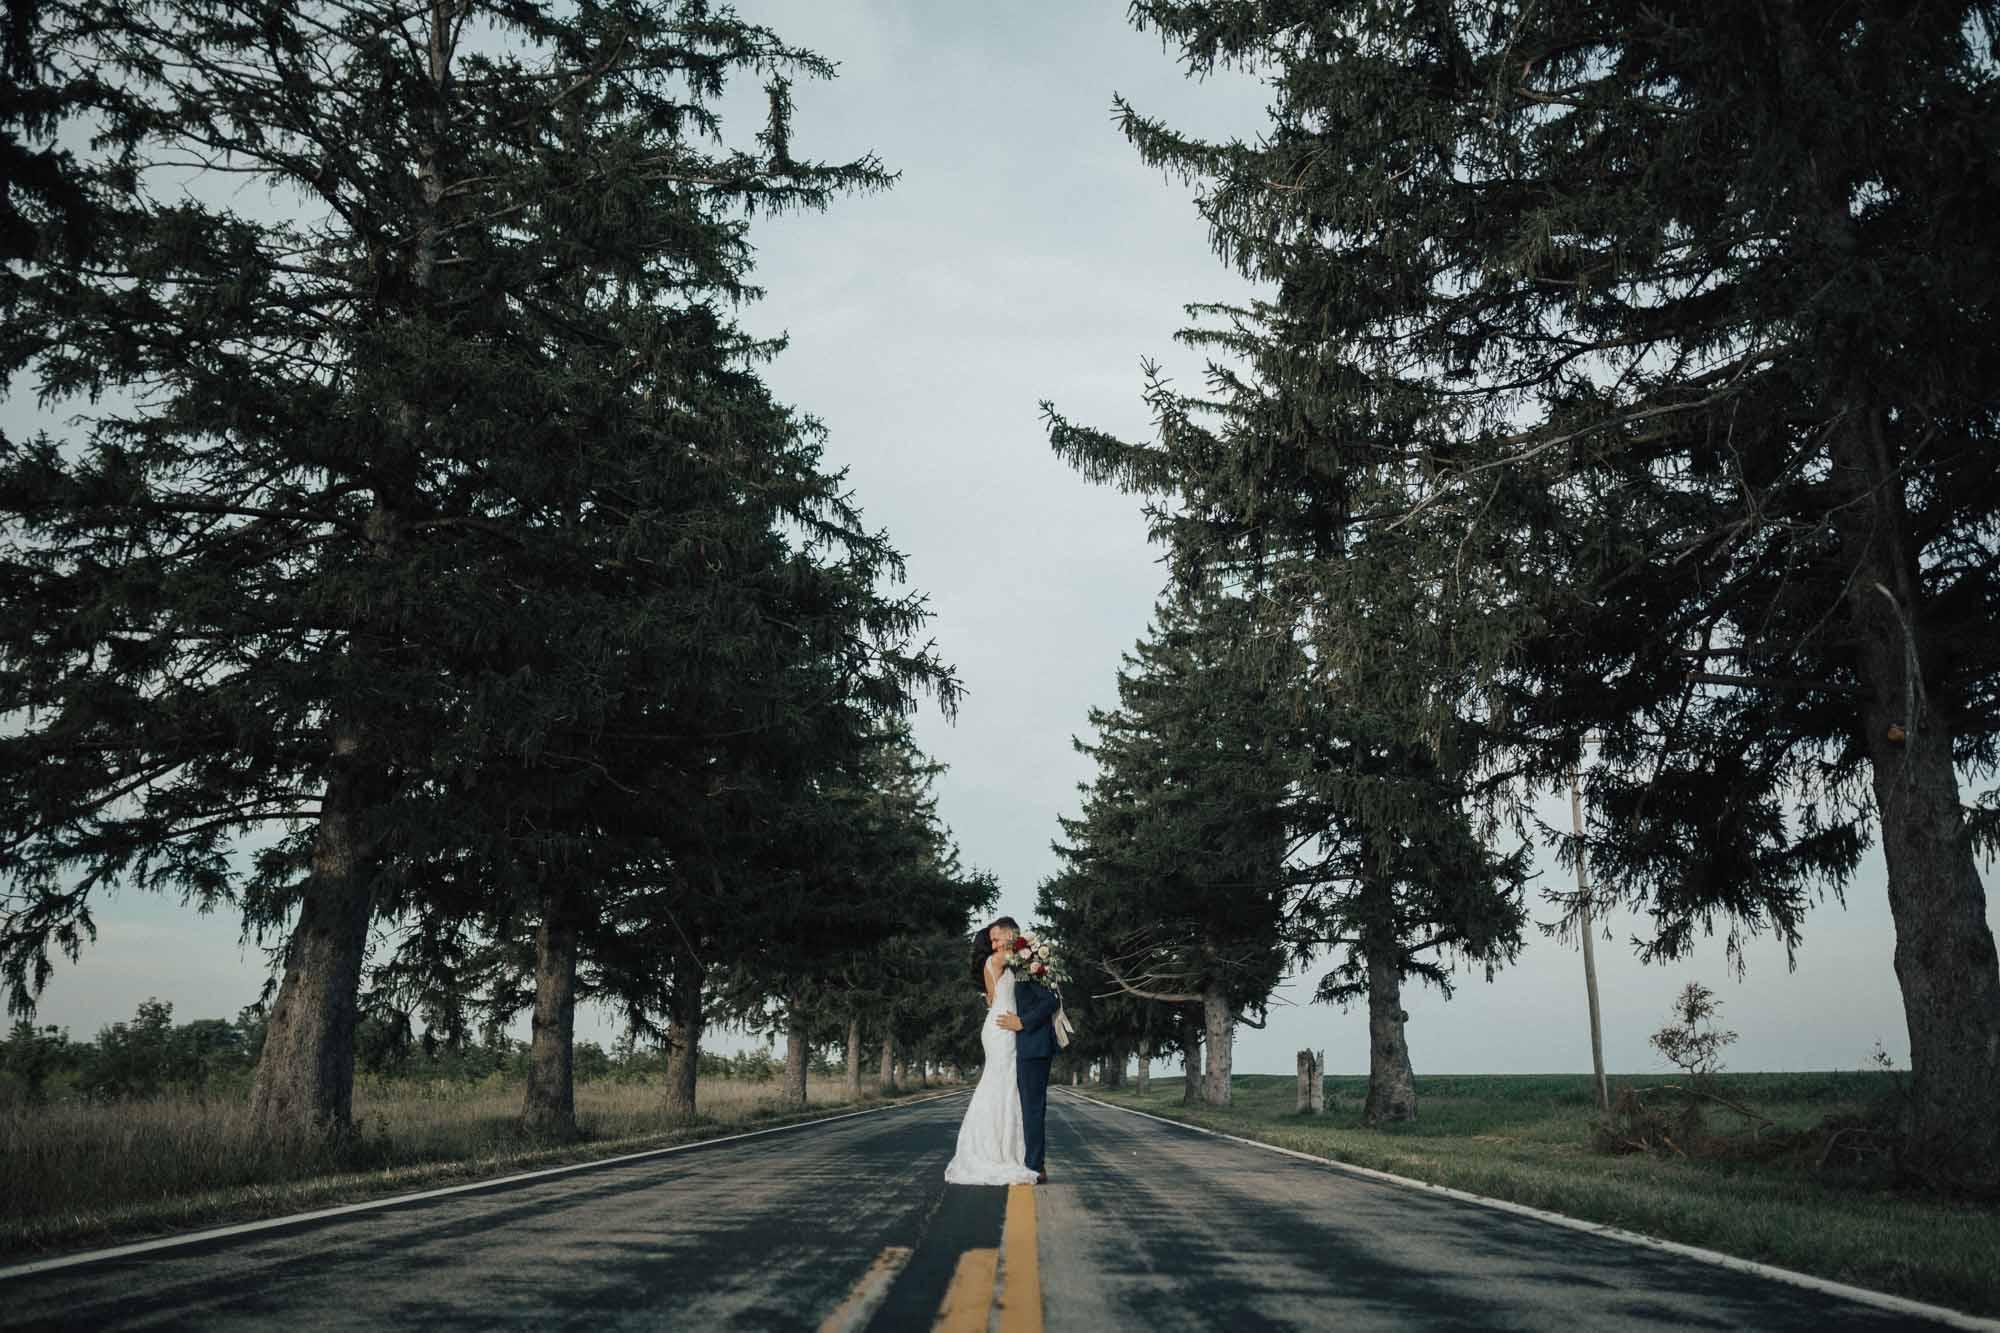 champaign_il_wedding_photography-0766.jpg